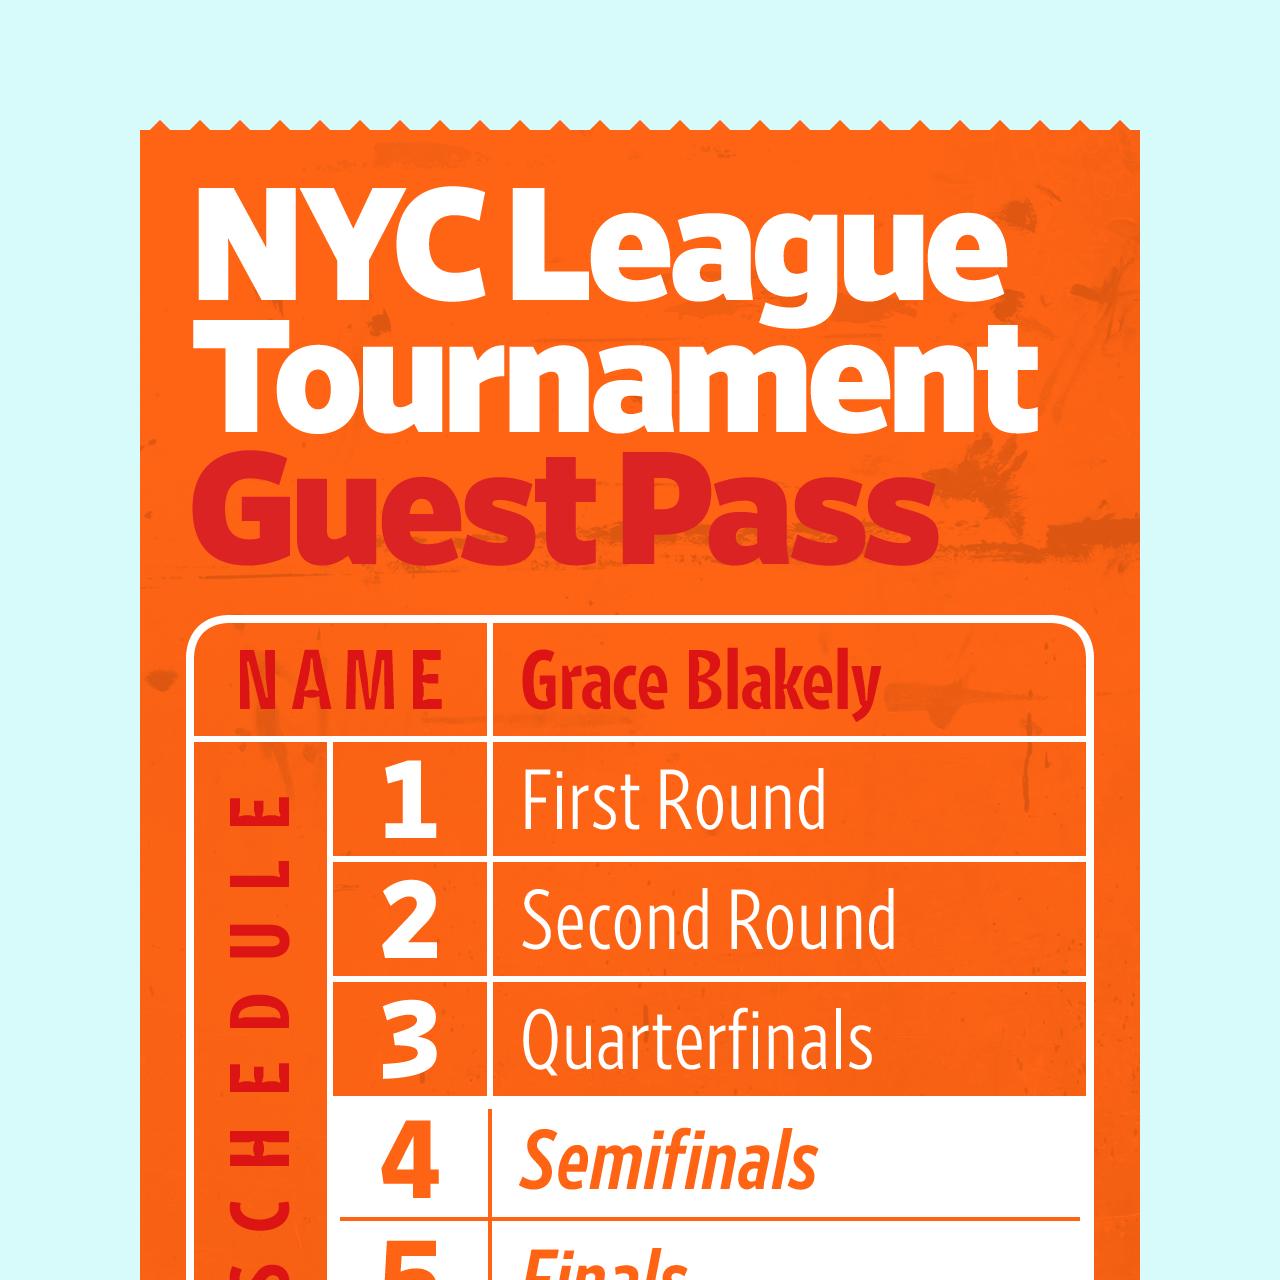 retina-nyc-tournament-1280x1280.png